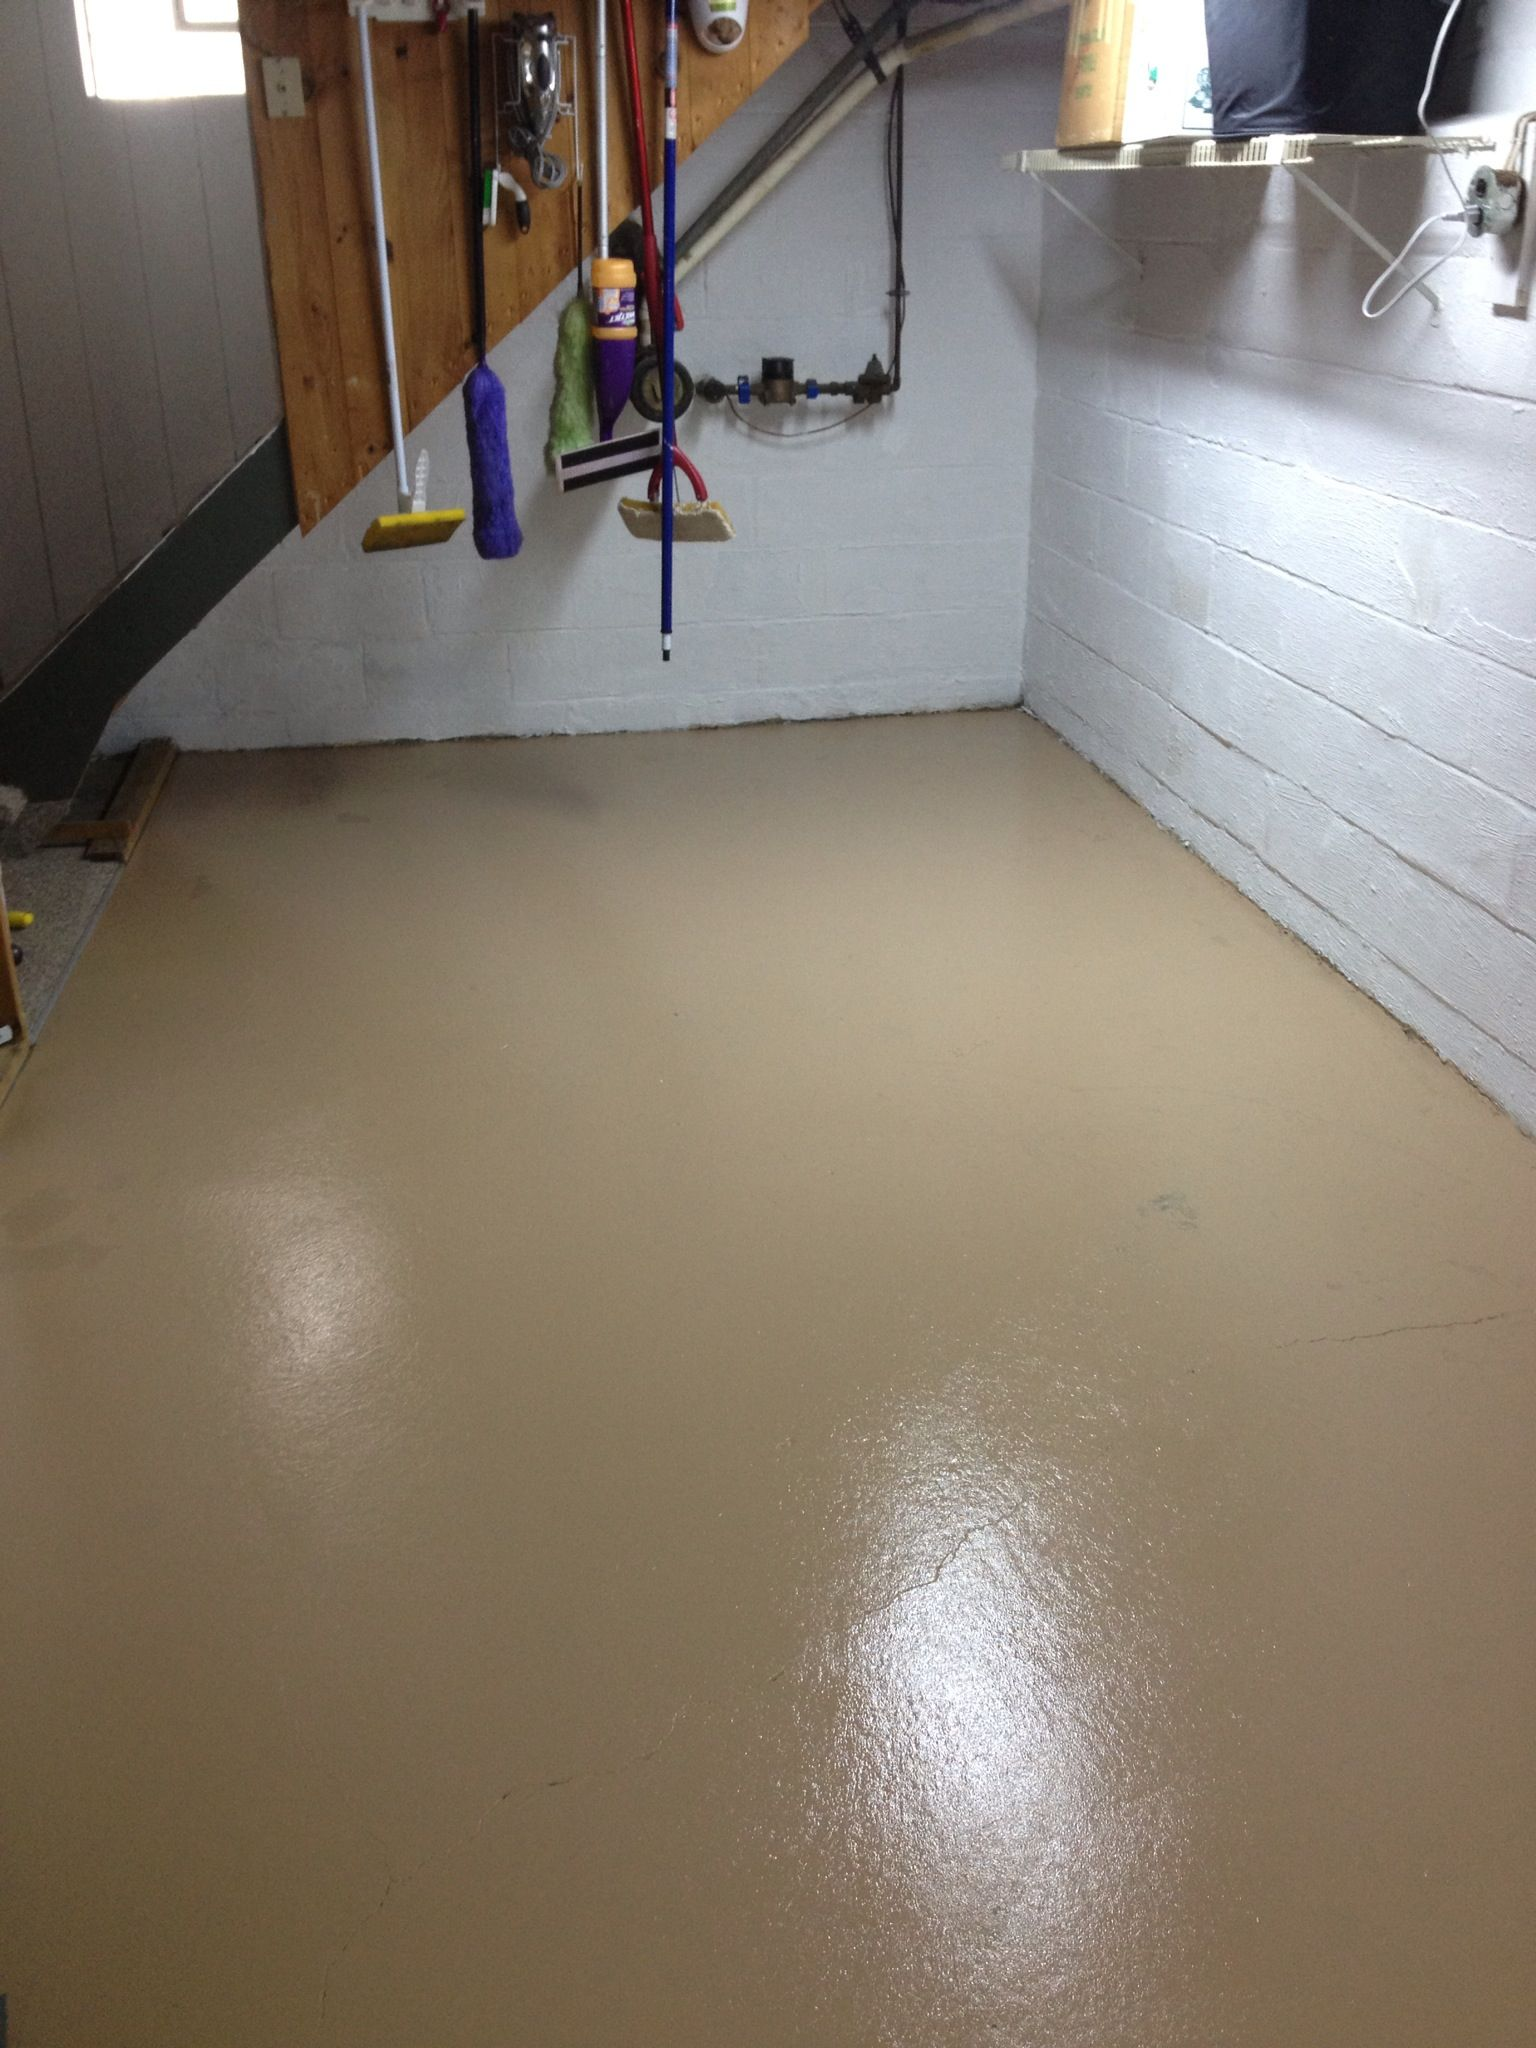 Basement Laundry Room Facelift New Floor Paint And Wall Paint Basement Makeover Room Facelift Laundry Room Update